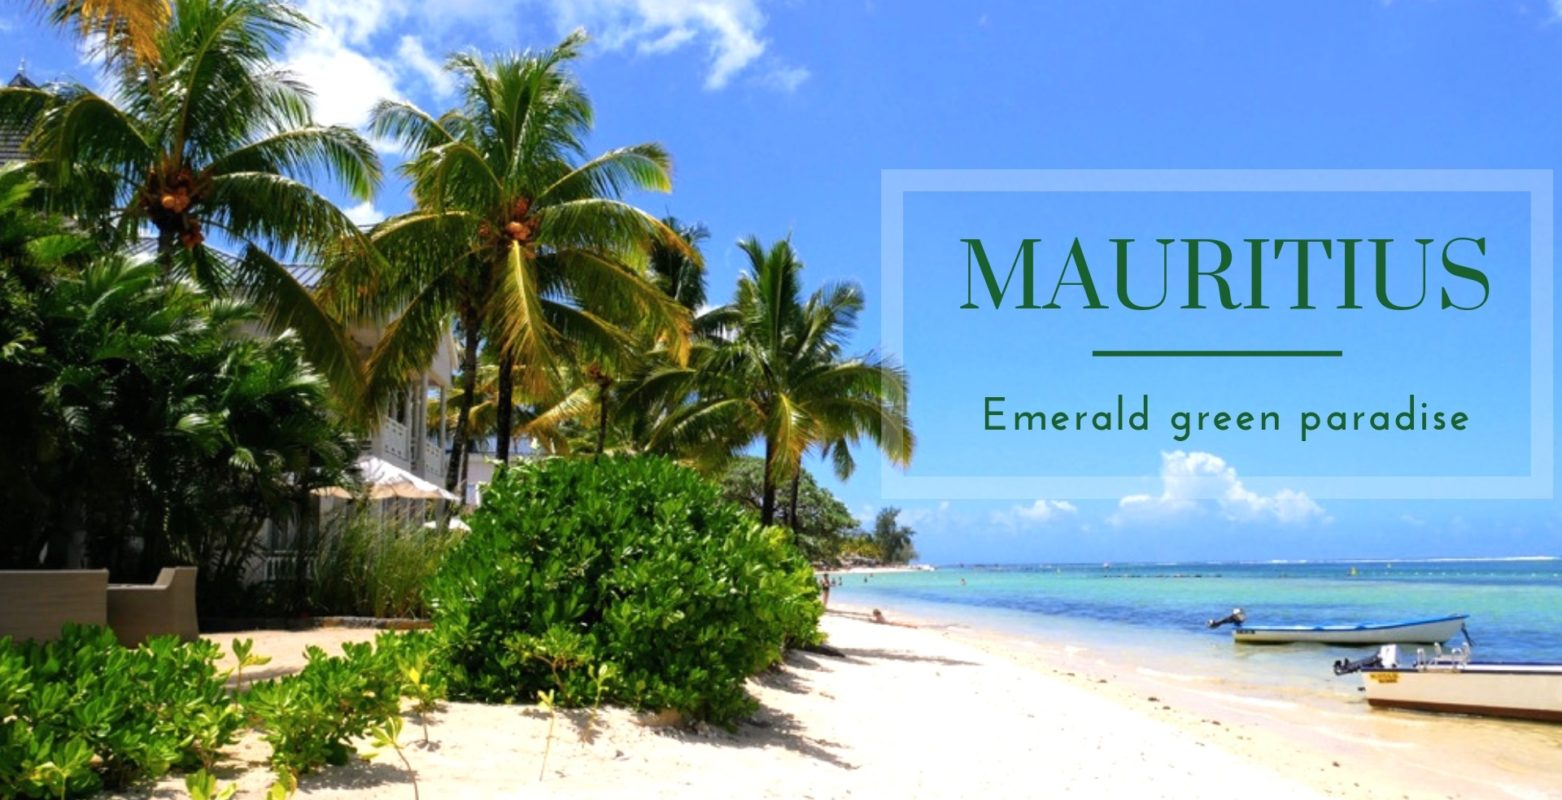 Mauritius – Emerald green paradise